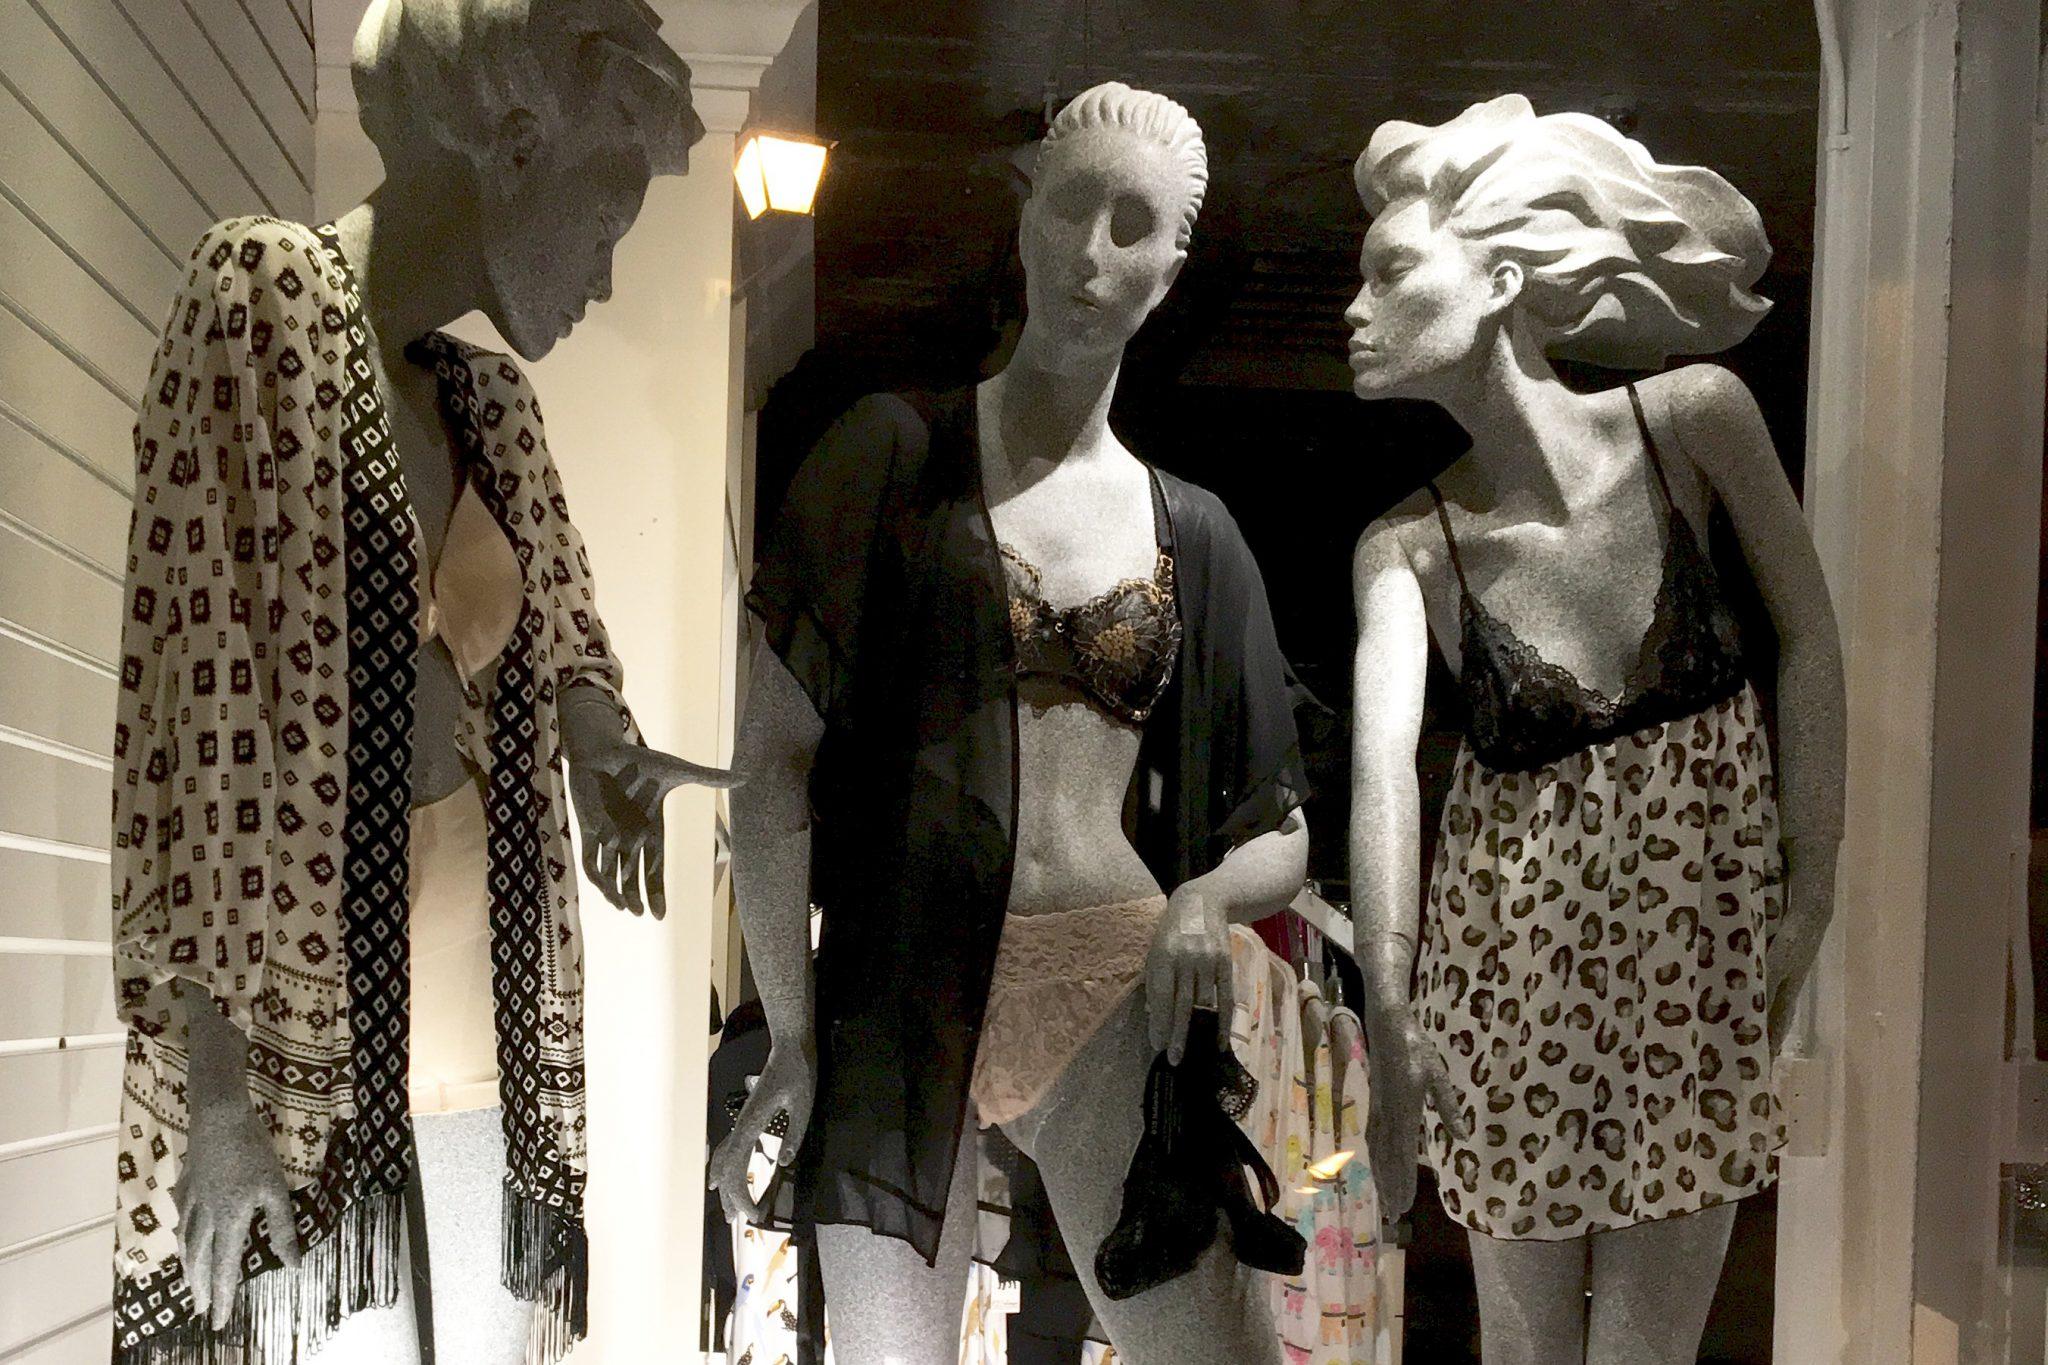 The-Shoppe-Signature-Mannequins-Bras-Panties-Collection-Lingerie-Store-The-Dain-Shoppe-Morristown-NJ-featured.jpg